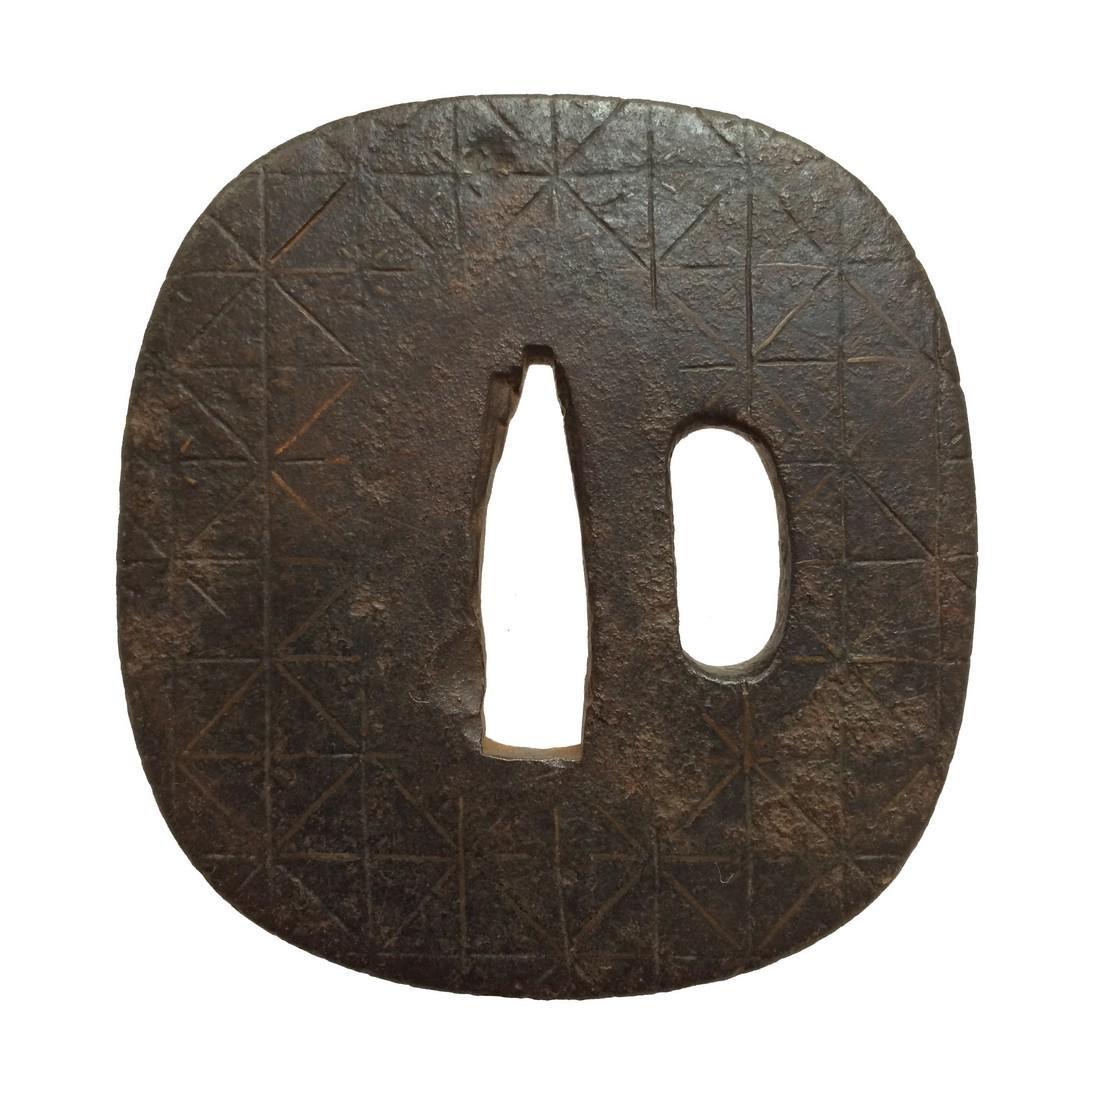 Tsuba with geometric diaper design (myriad treasures)